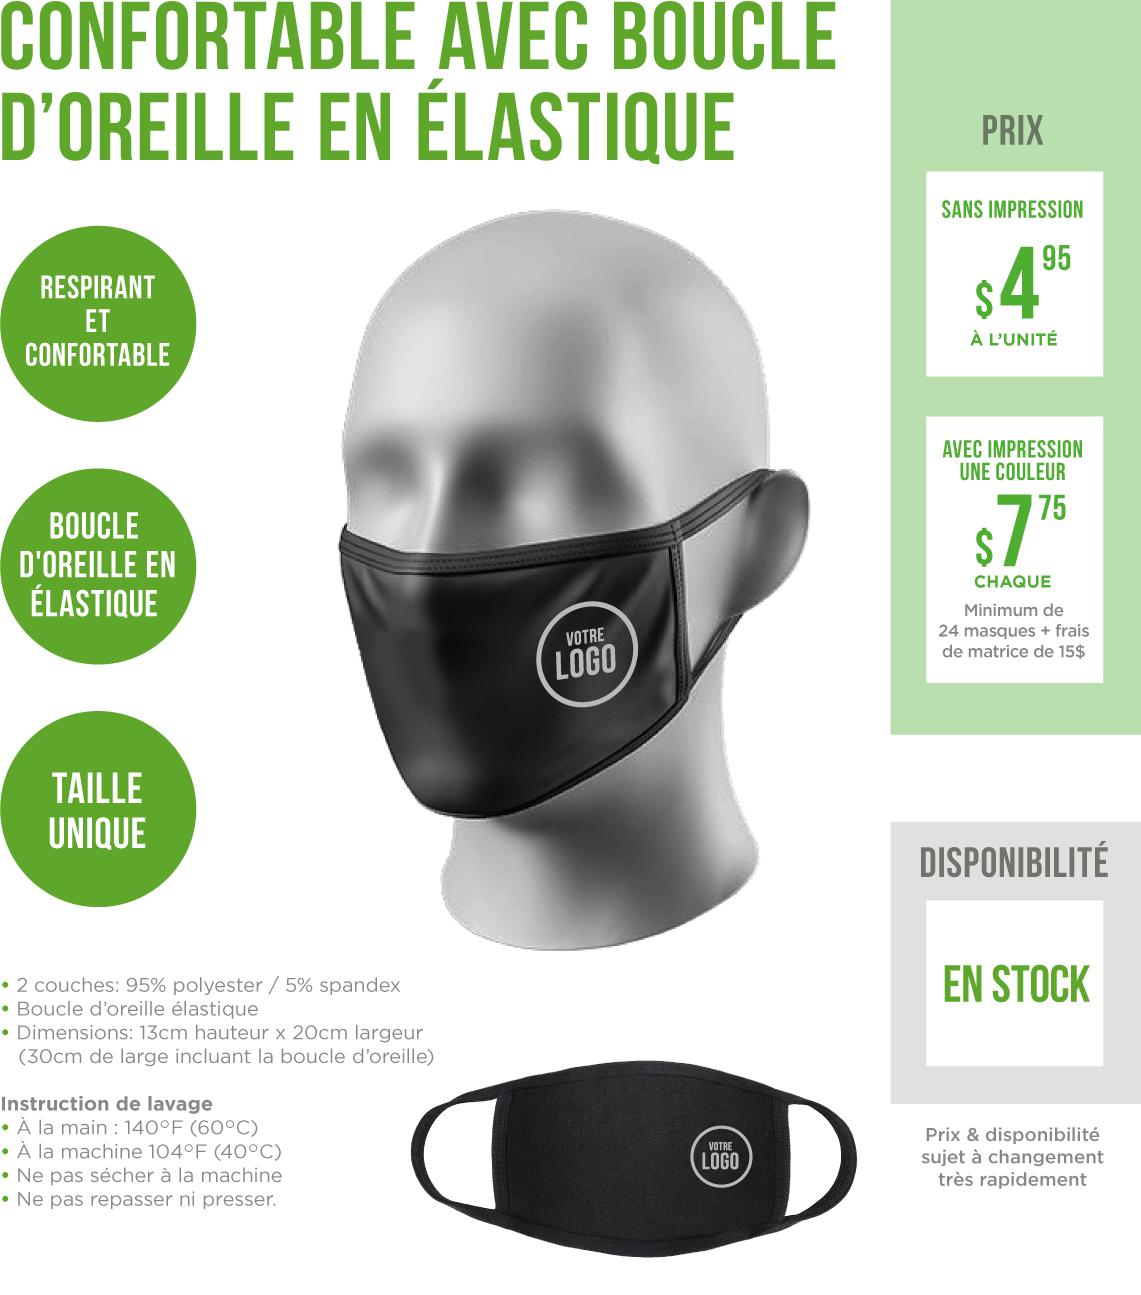 Masque6enstock